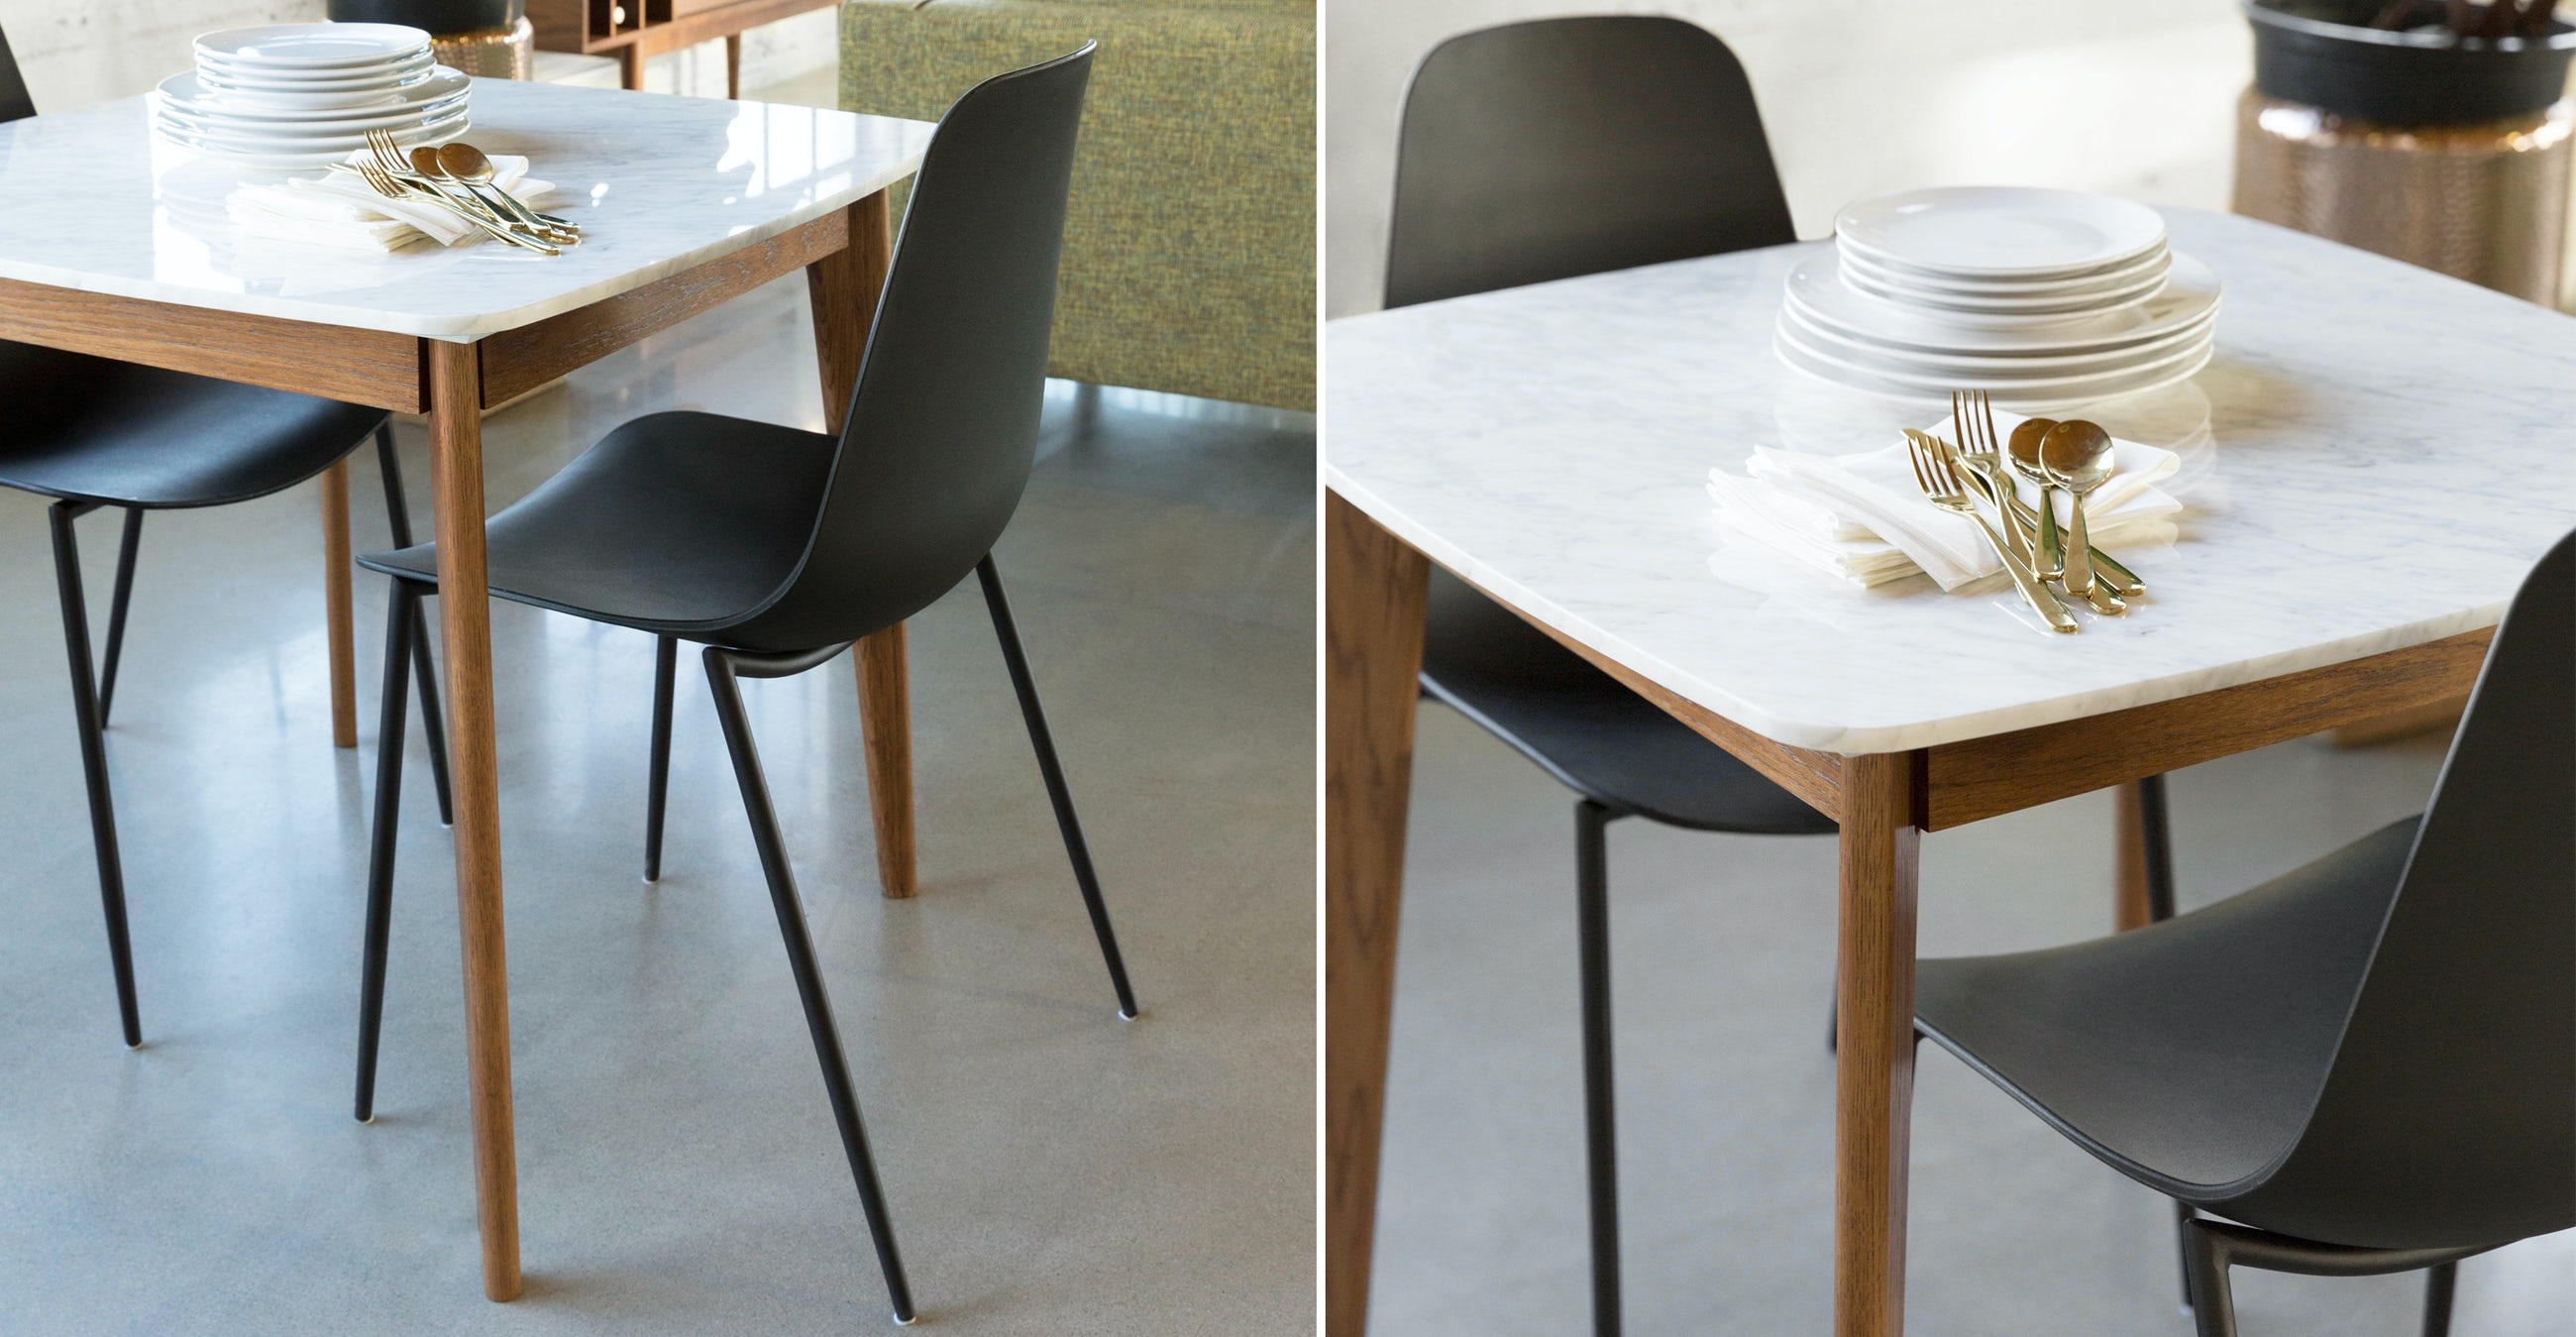 Vena Walnut Cafe Table